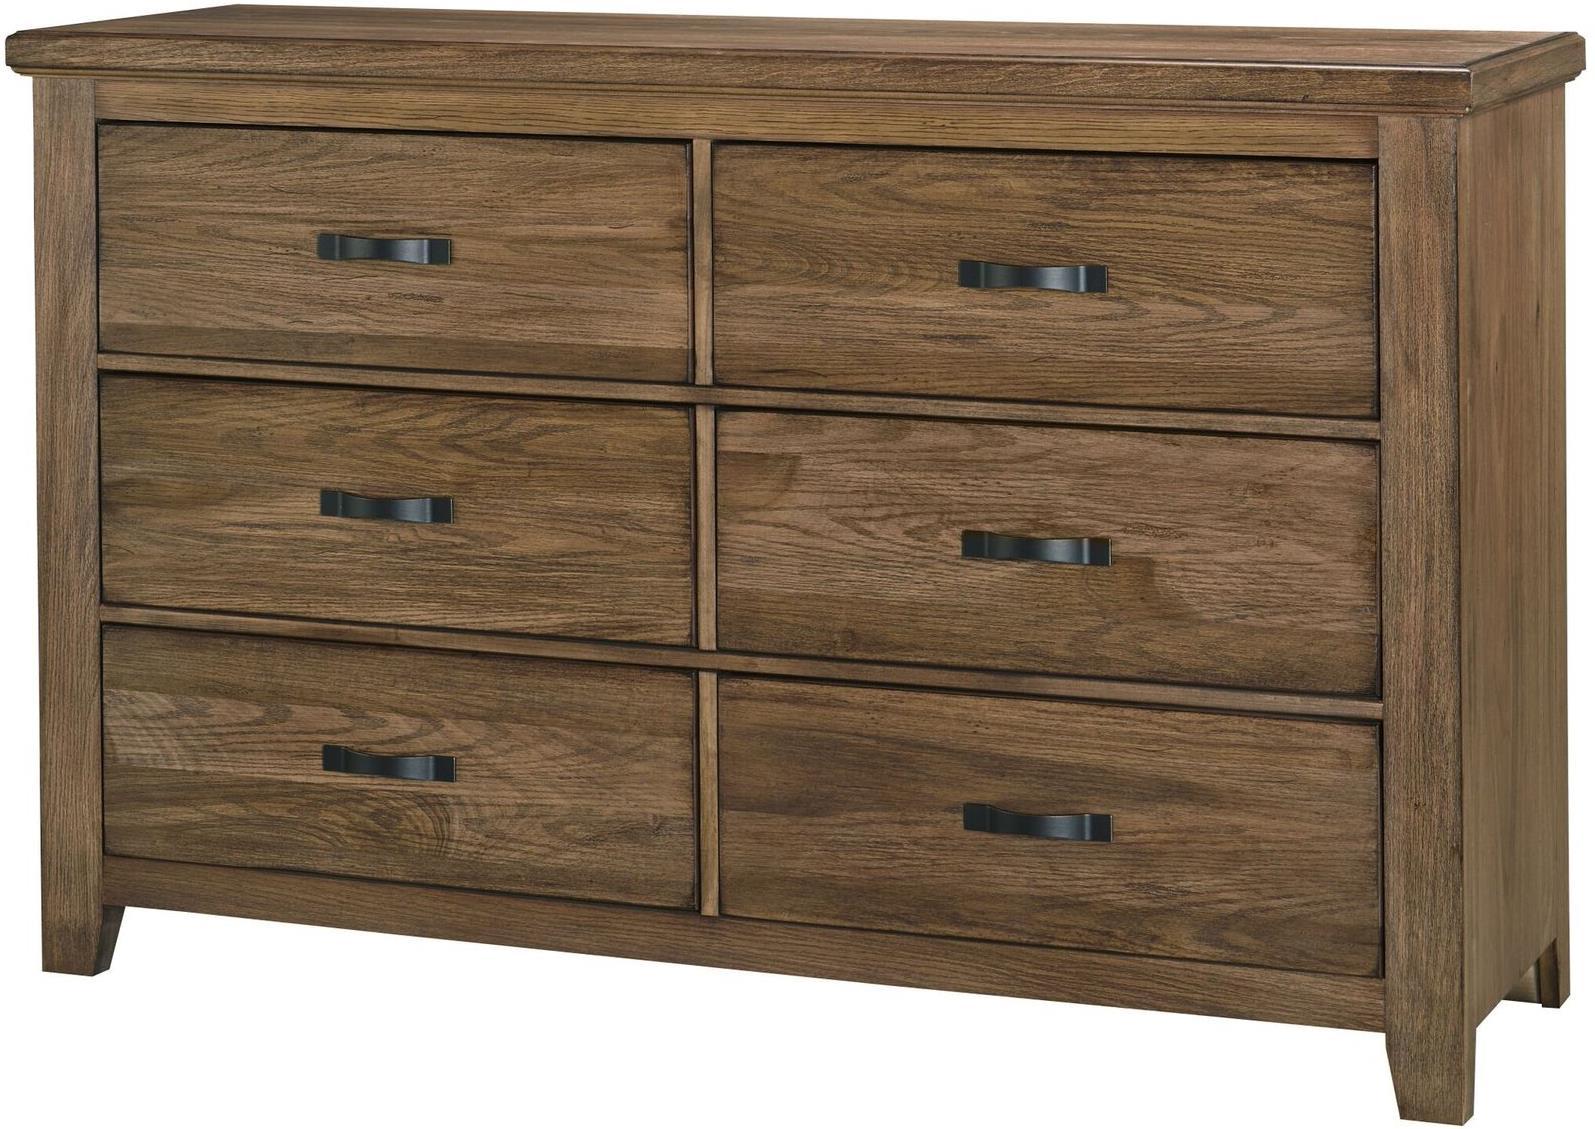 Vaughan Bassett Cassell Park Storage Dresser-6 Drawer - Item Number: 514-002